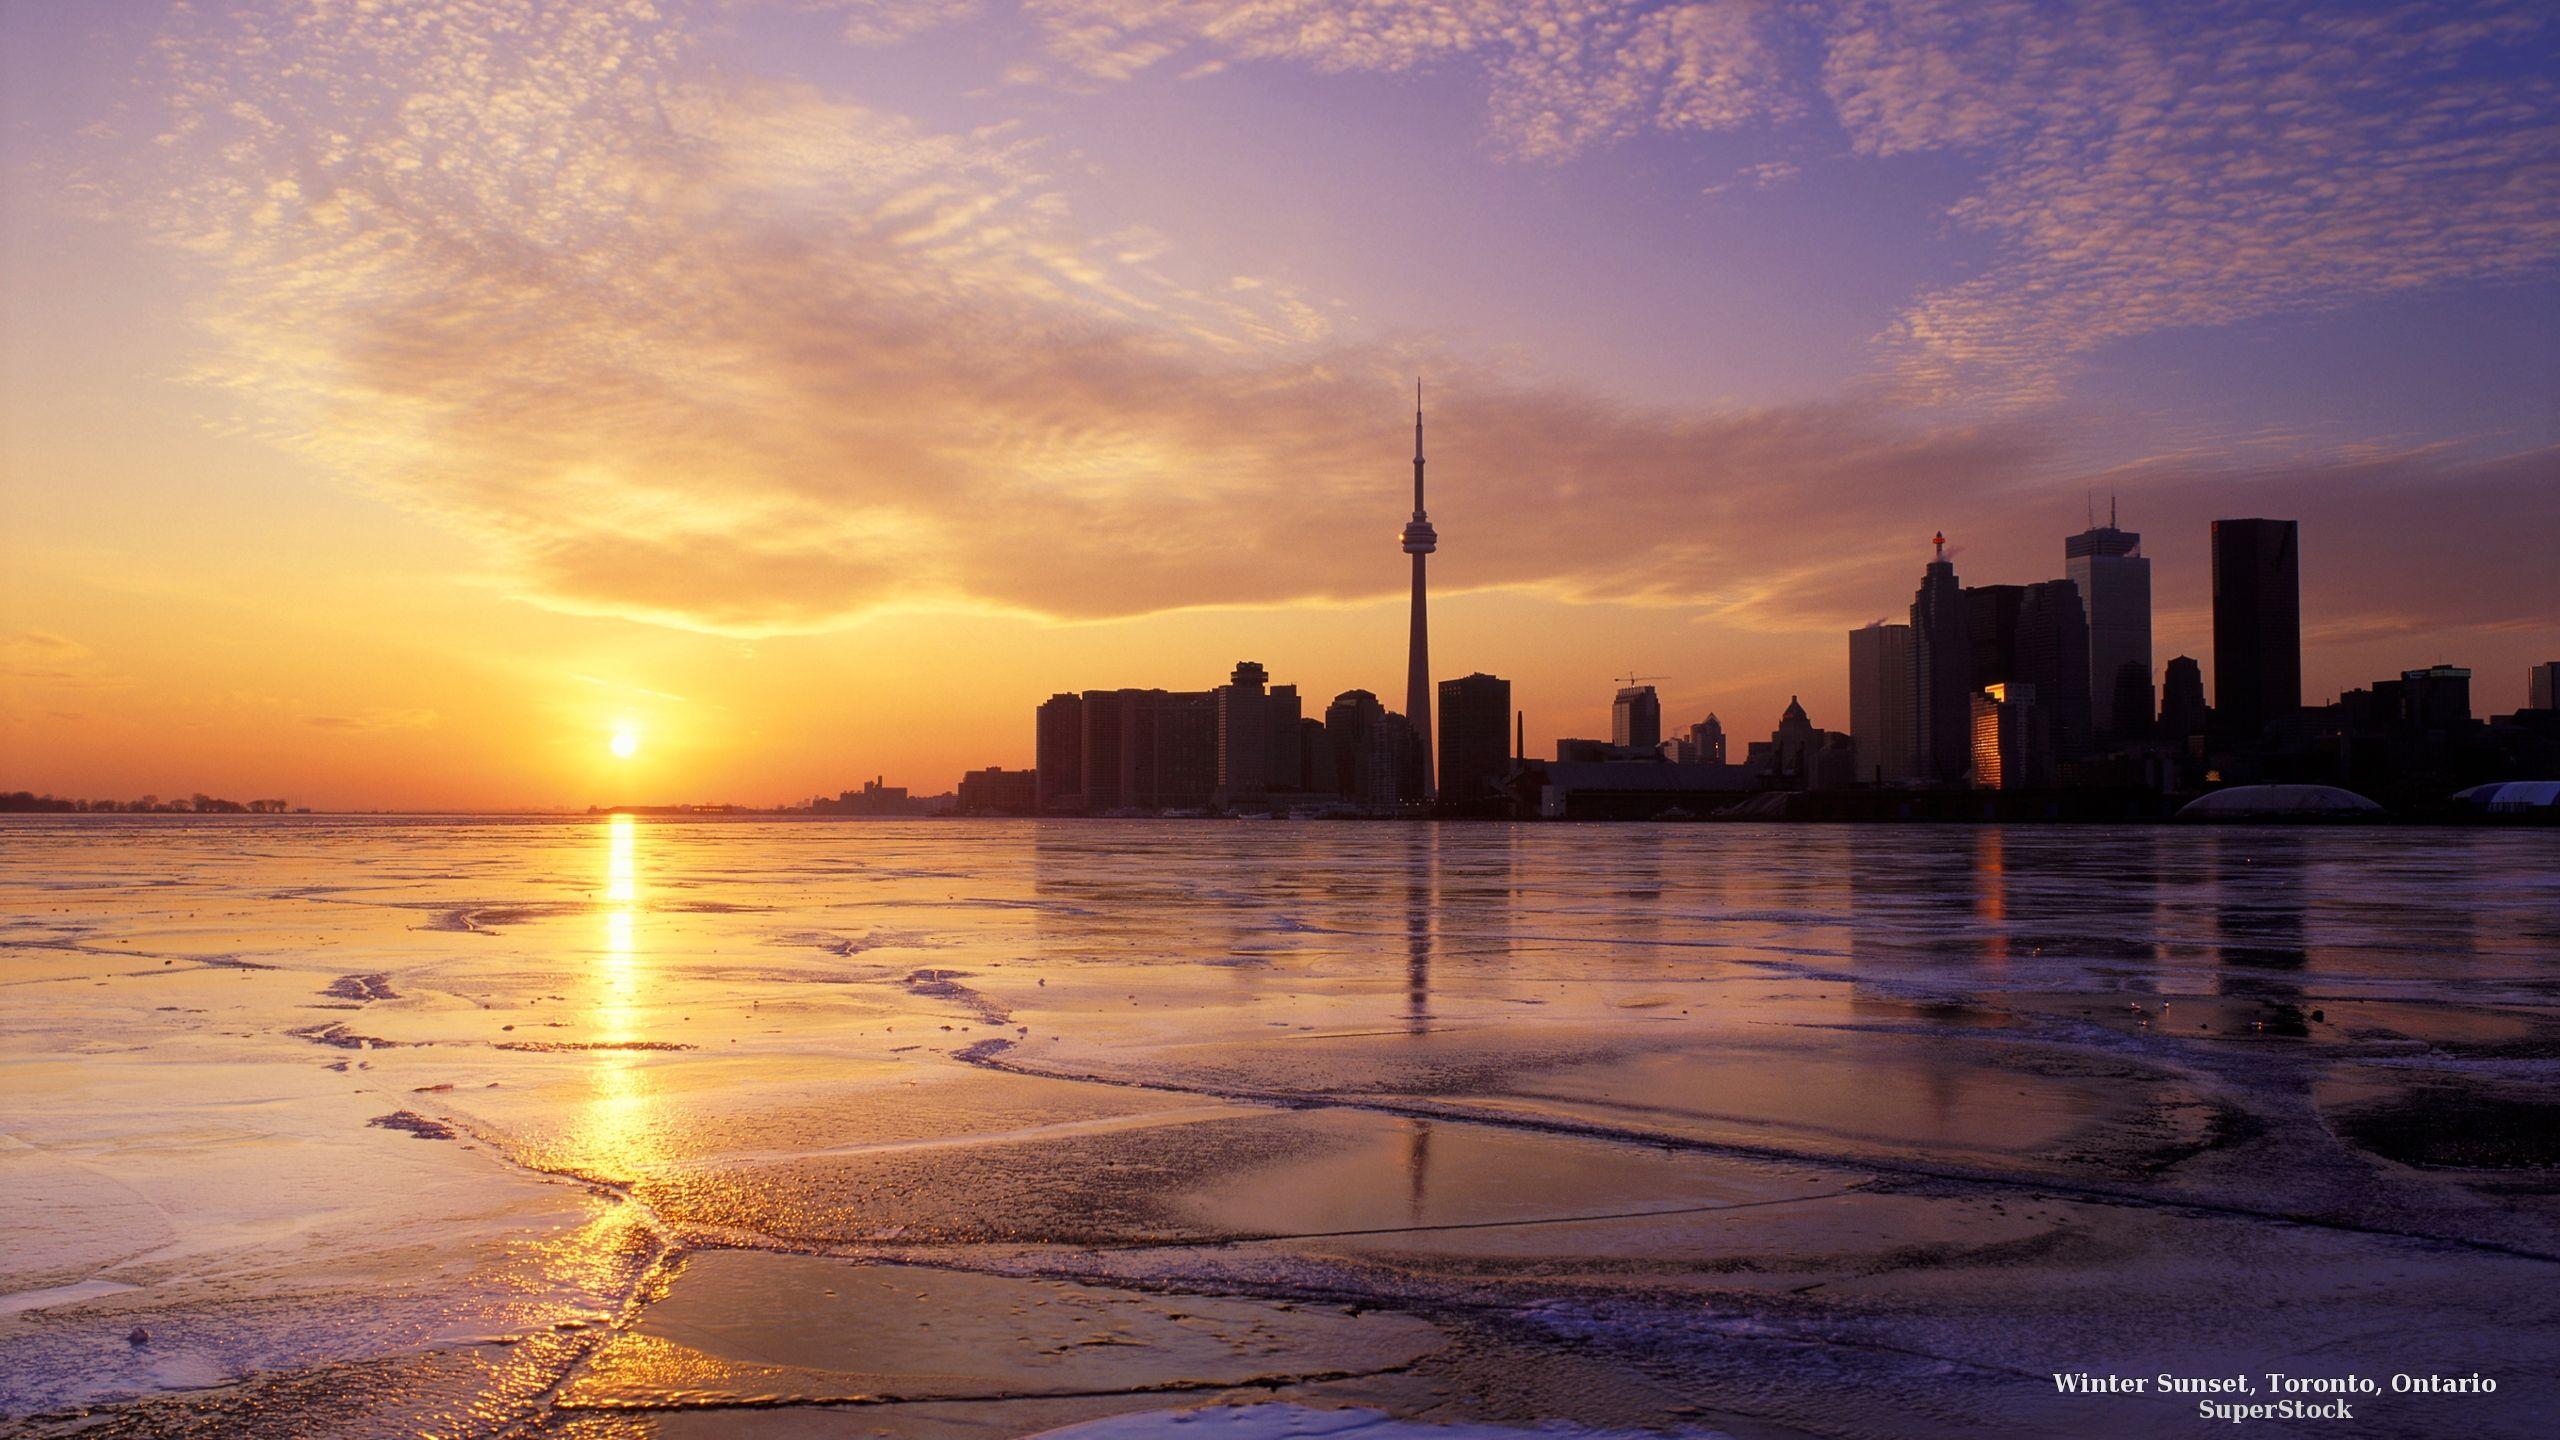 Pôr do sol de inverno, Toronto, Ontario